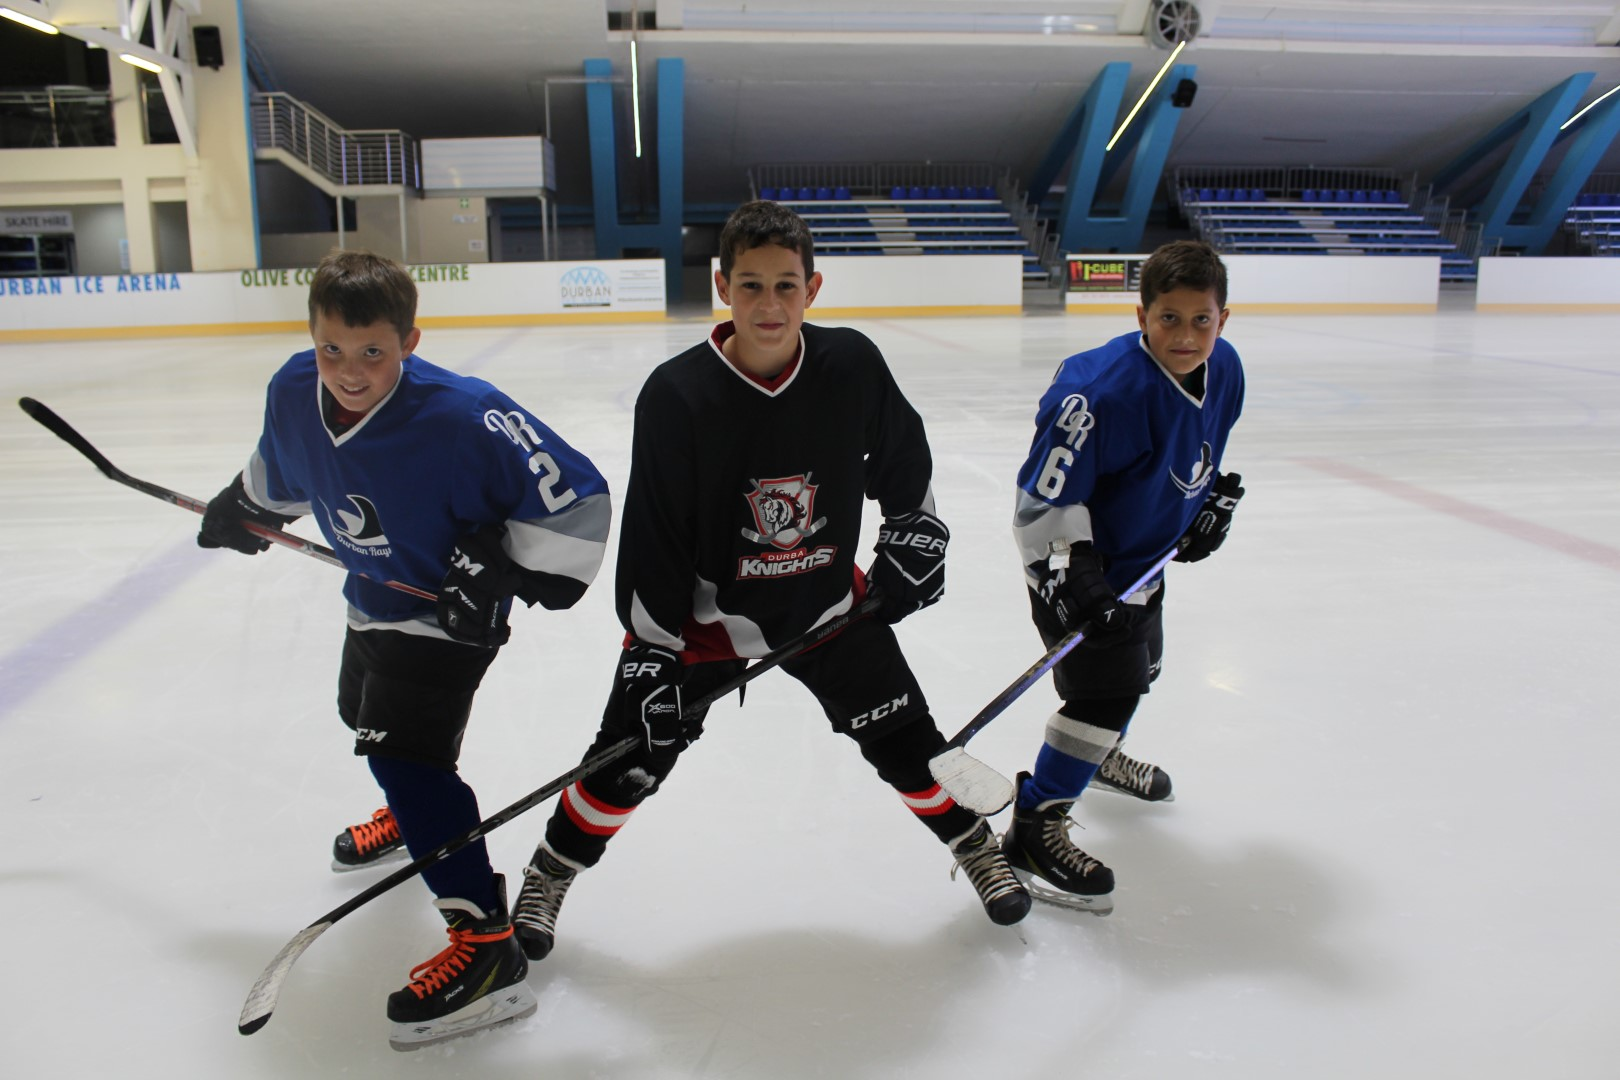 Bryce Woolf, Seth Gwynn and Alex Wesselink will represent the KwaZulu Natal U12 ice hockey team at the inter-provincial tournament in July.